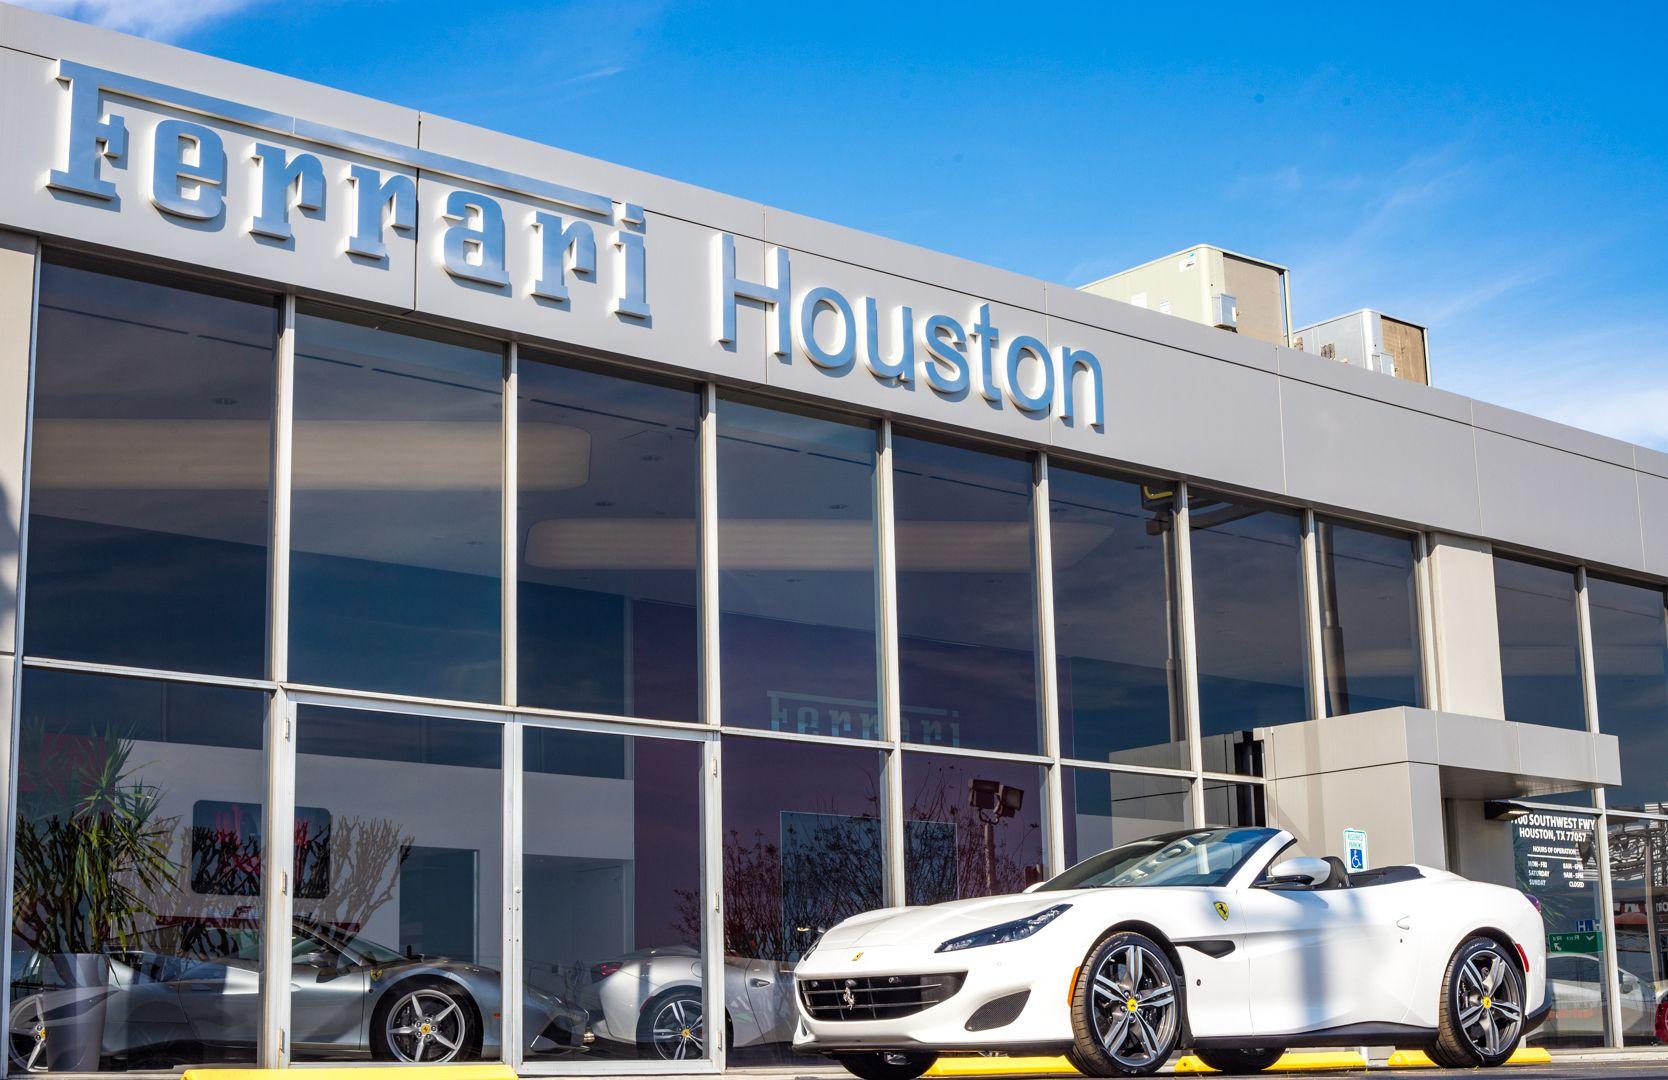 Waiting To Be Taken For A Ride Ferrariofhouston Ferrariportofino Houstonluxury Ferrari Luxurycars In 2020 Houston Luxury Portofino Ferrari